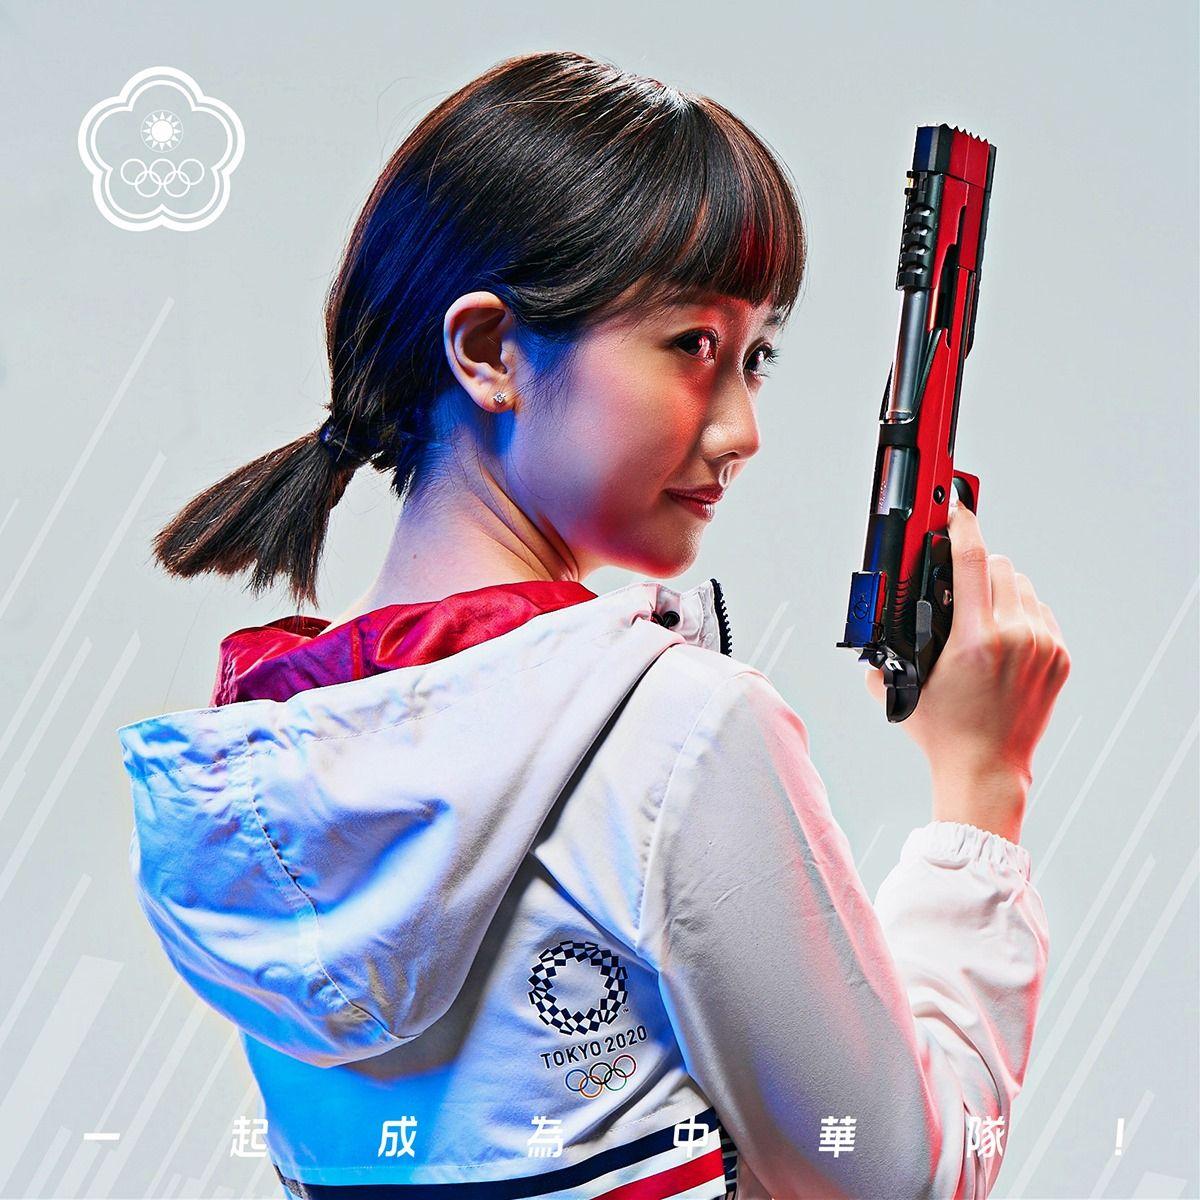 吳佳穎。(圖片來源/中華奧會 Chinese Taipei Olympic Committee@Facebook)